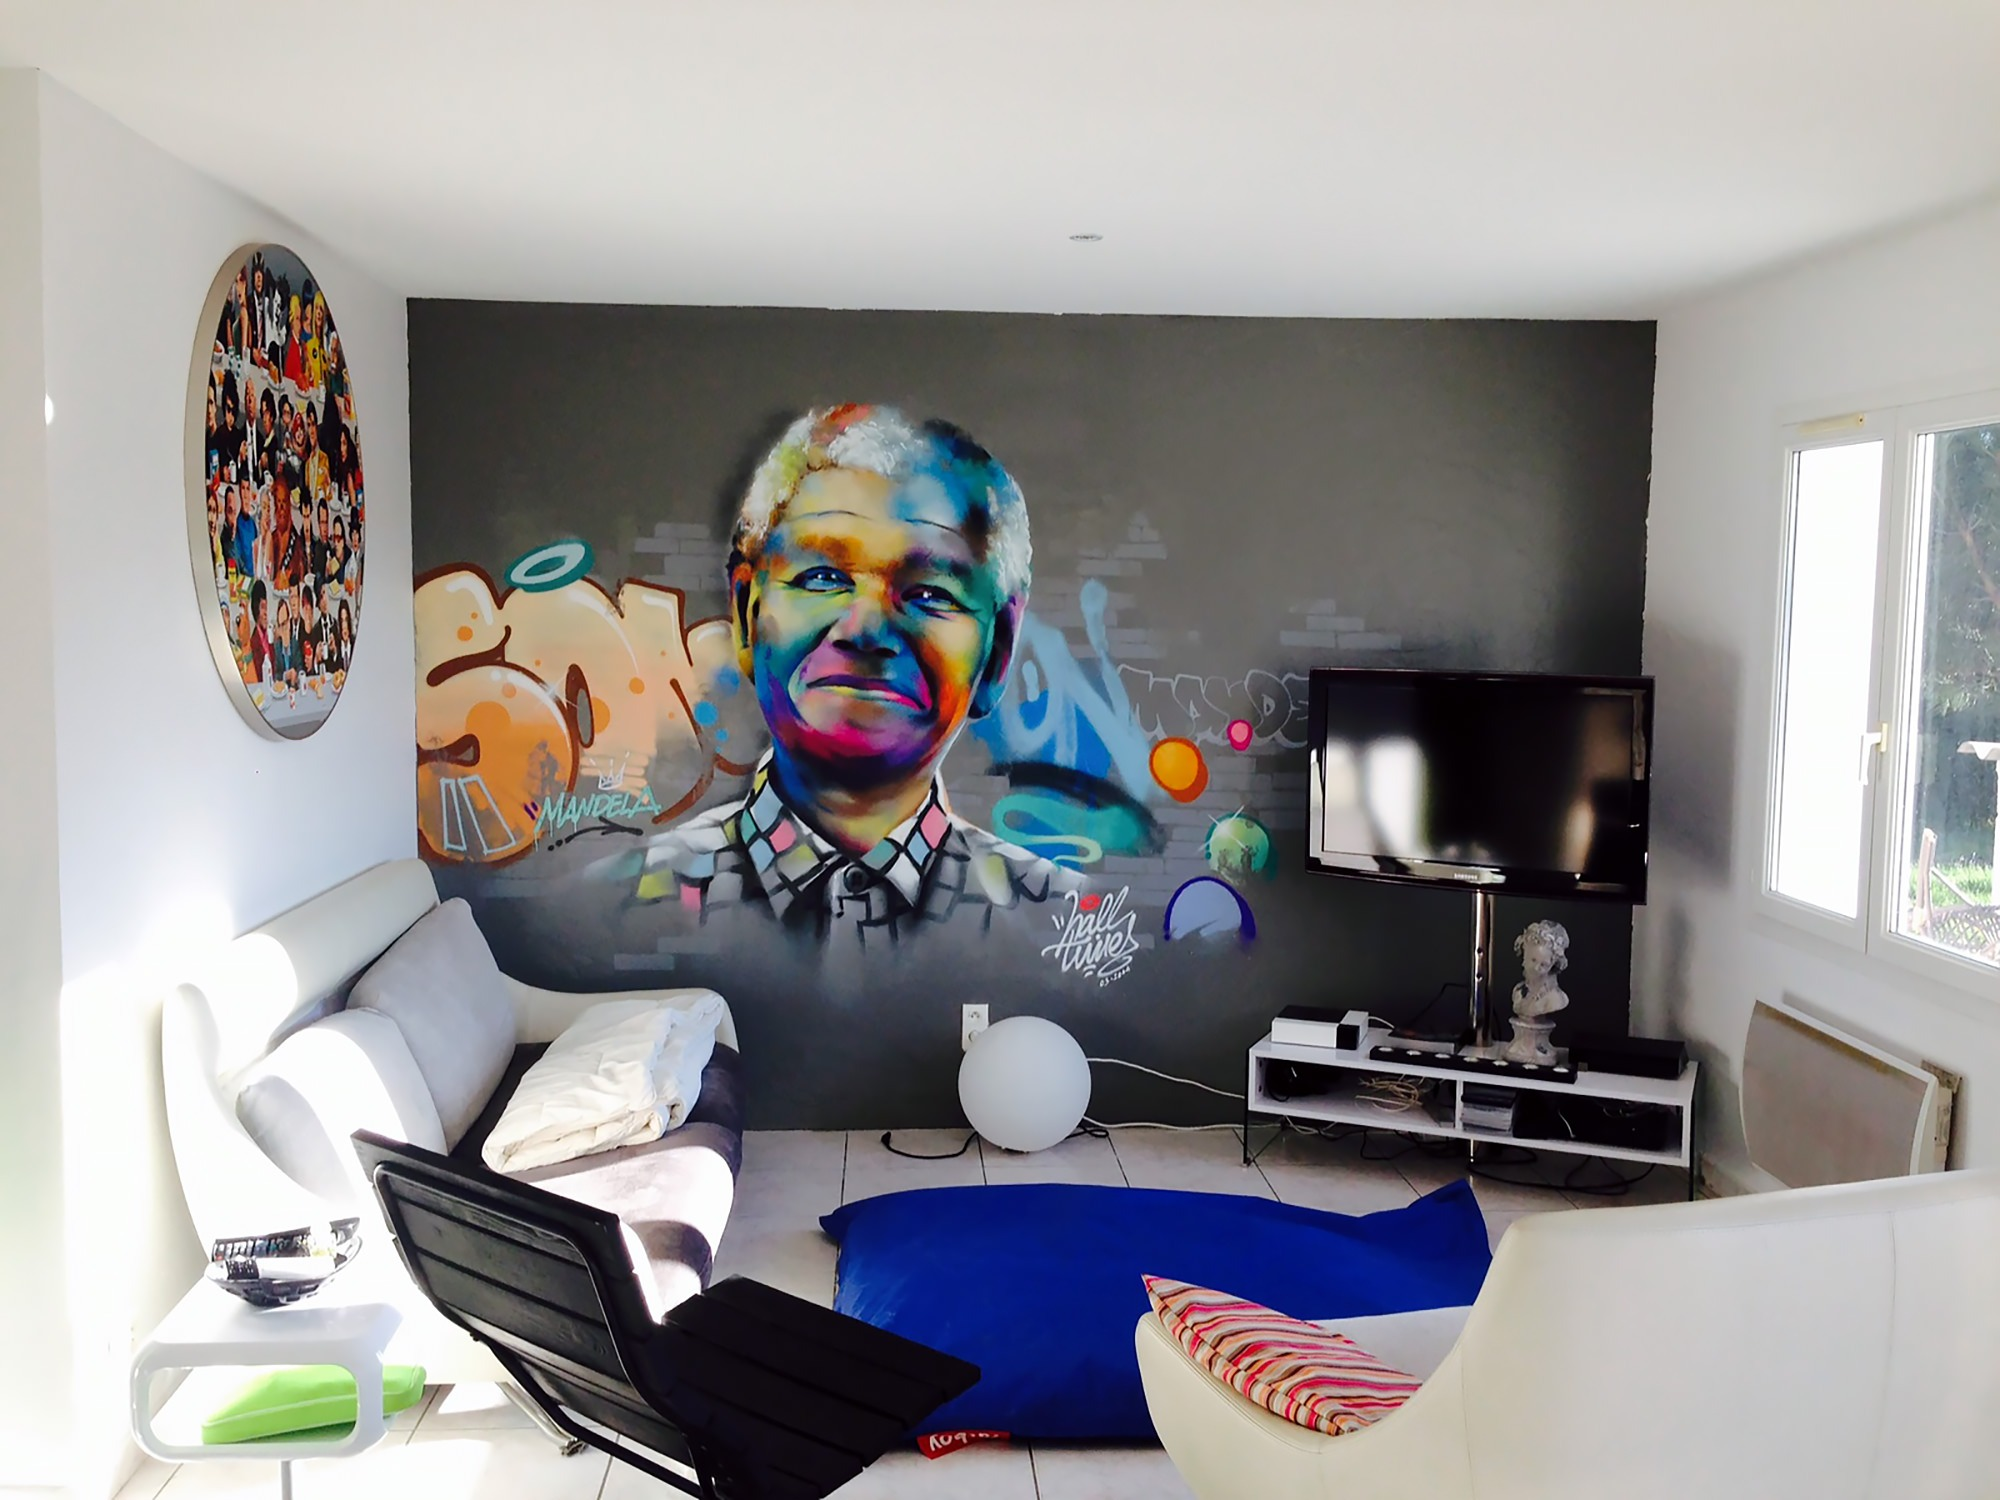 decoration-nelson-mandela-graffiti